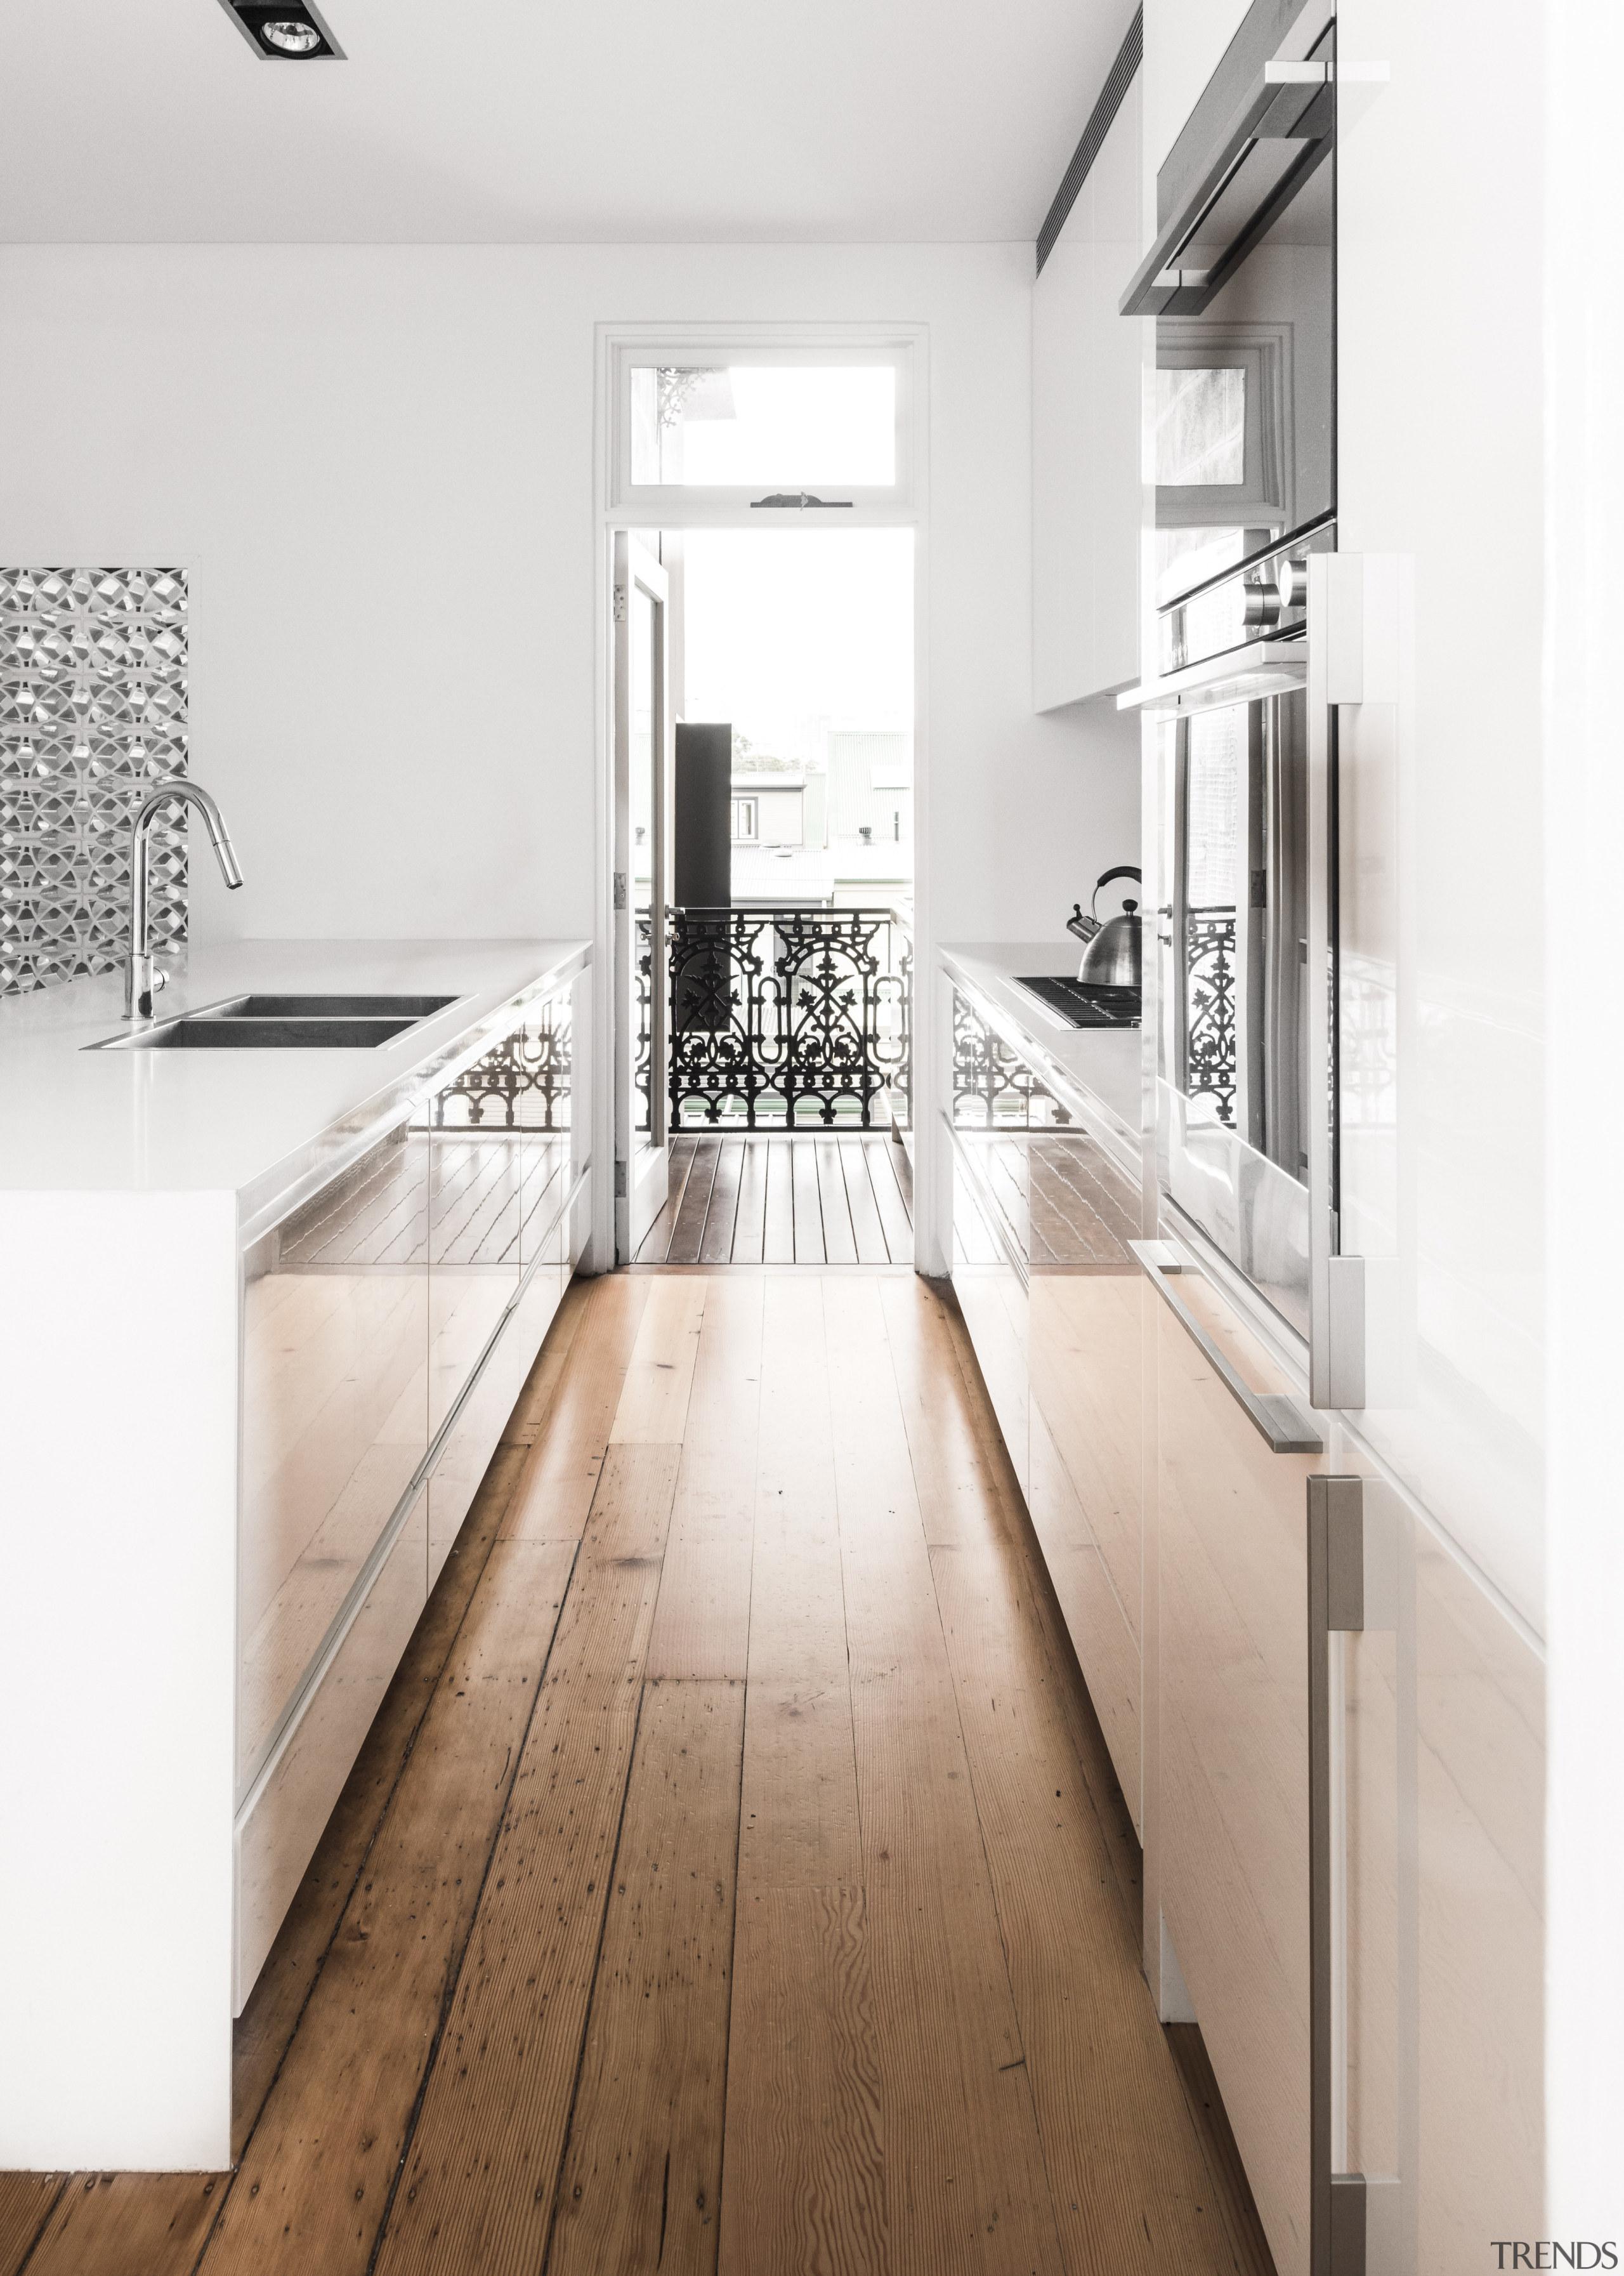 This new kitchen gains light from the breezeblock countertop, floor, flooring, interior design, kitchen, product design, tap, white